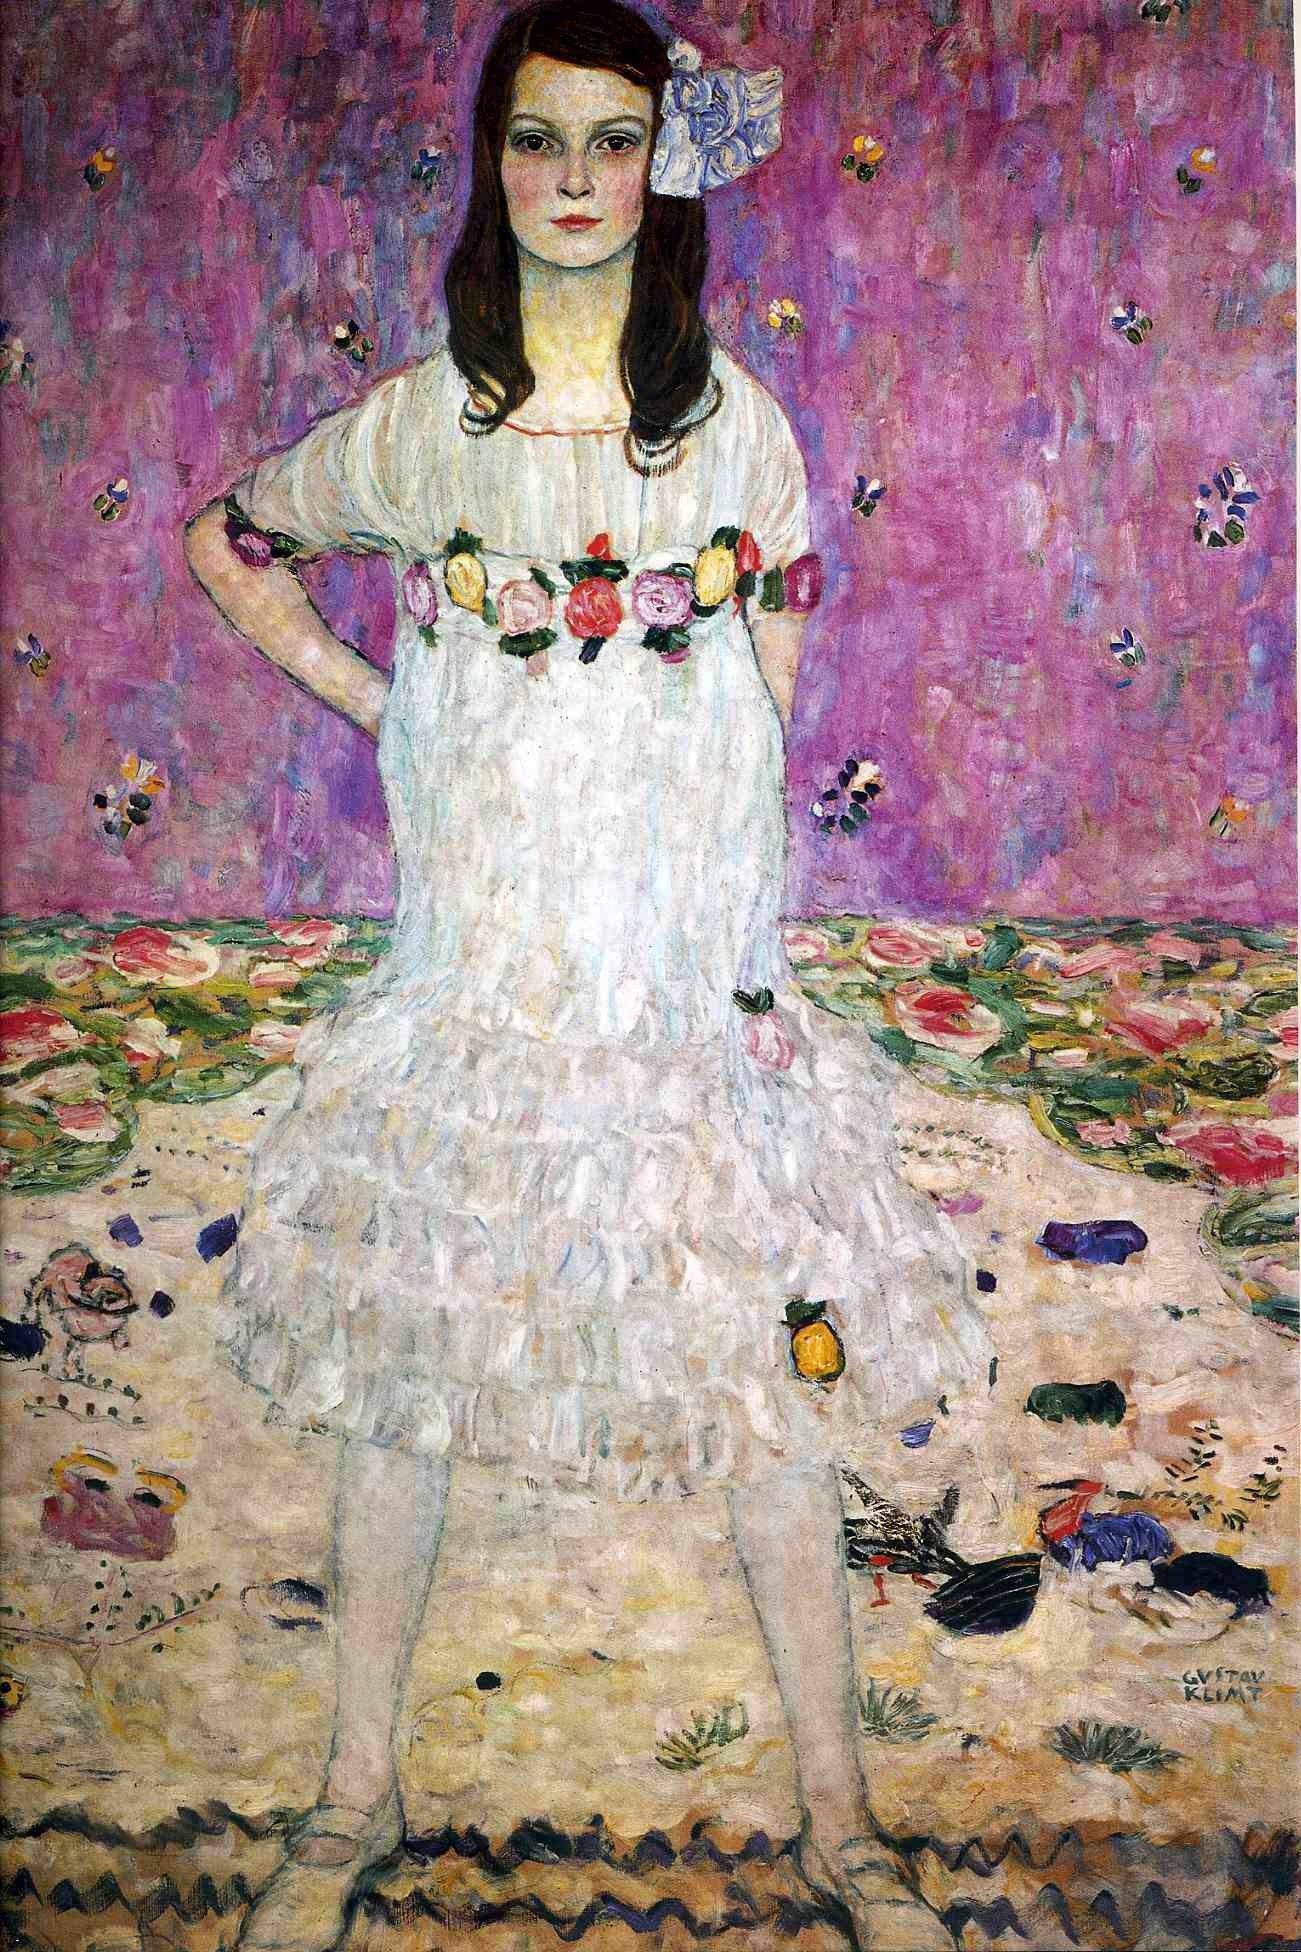 Gustav Klimt: Ritratto di Mäda Primavesi (1913) olio su tela 150x110. Stile: Simbolismo. Periodo: Opere mature